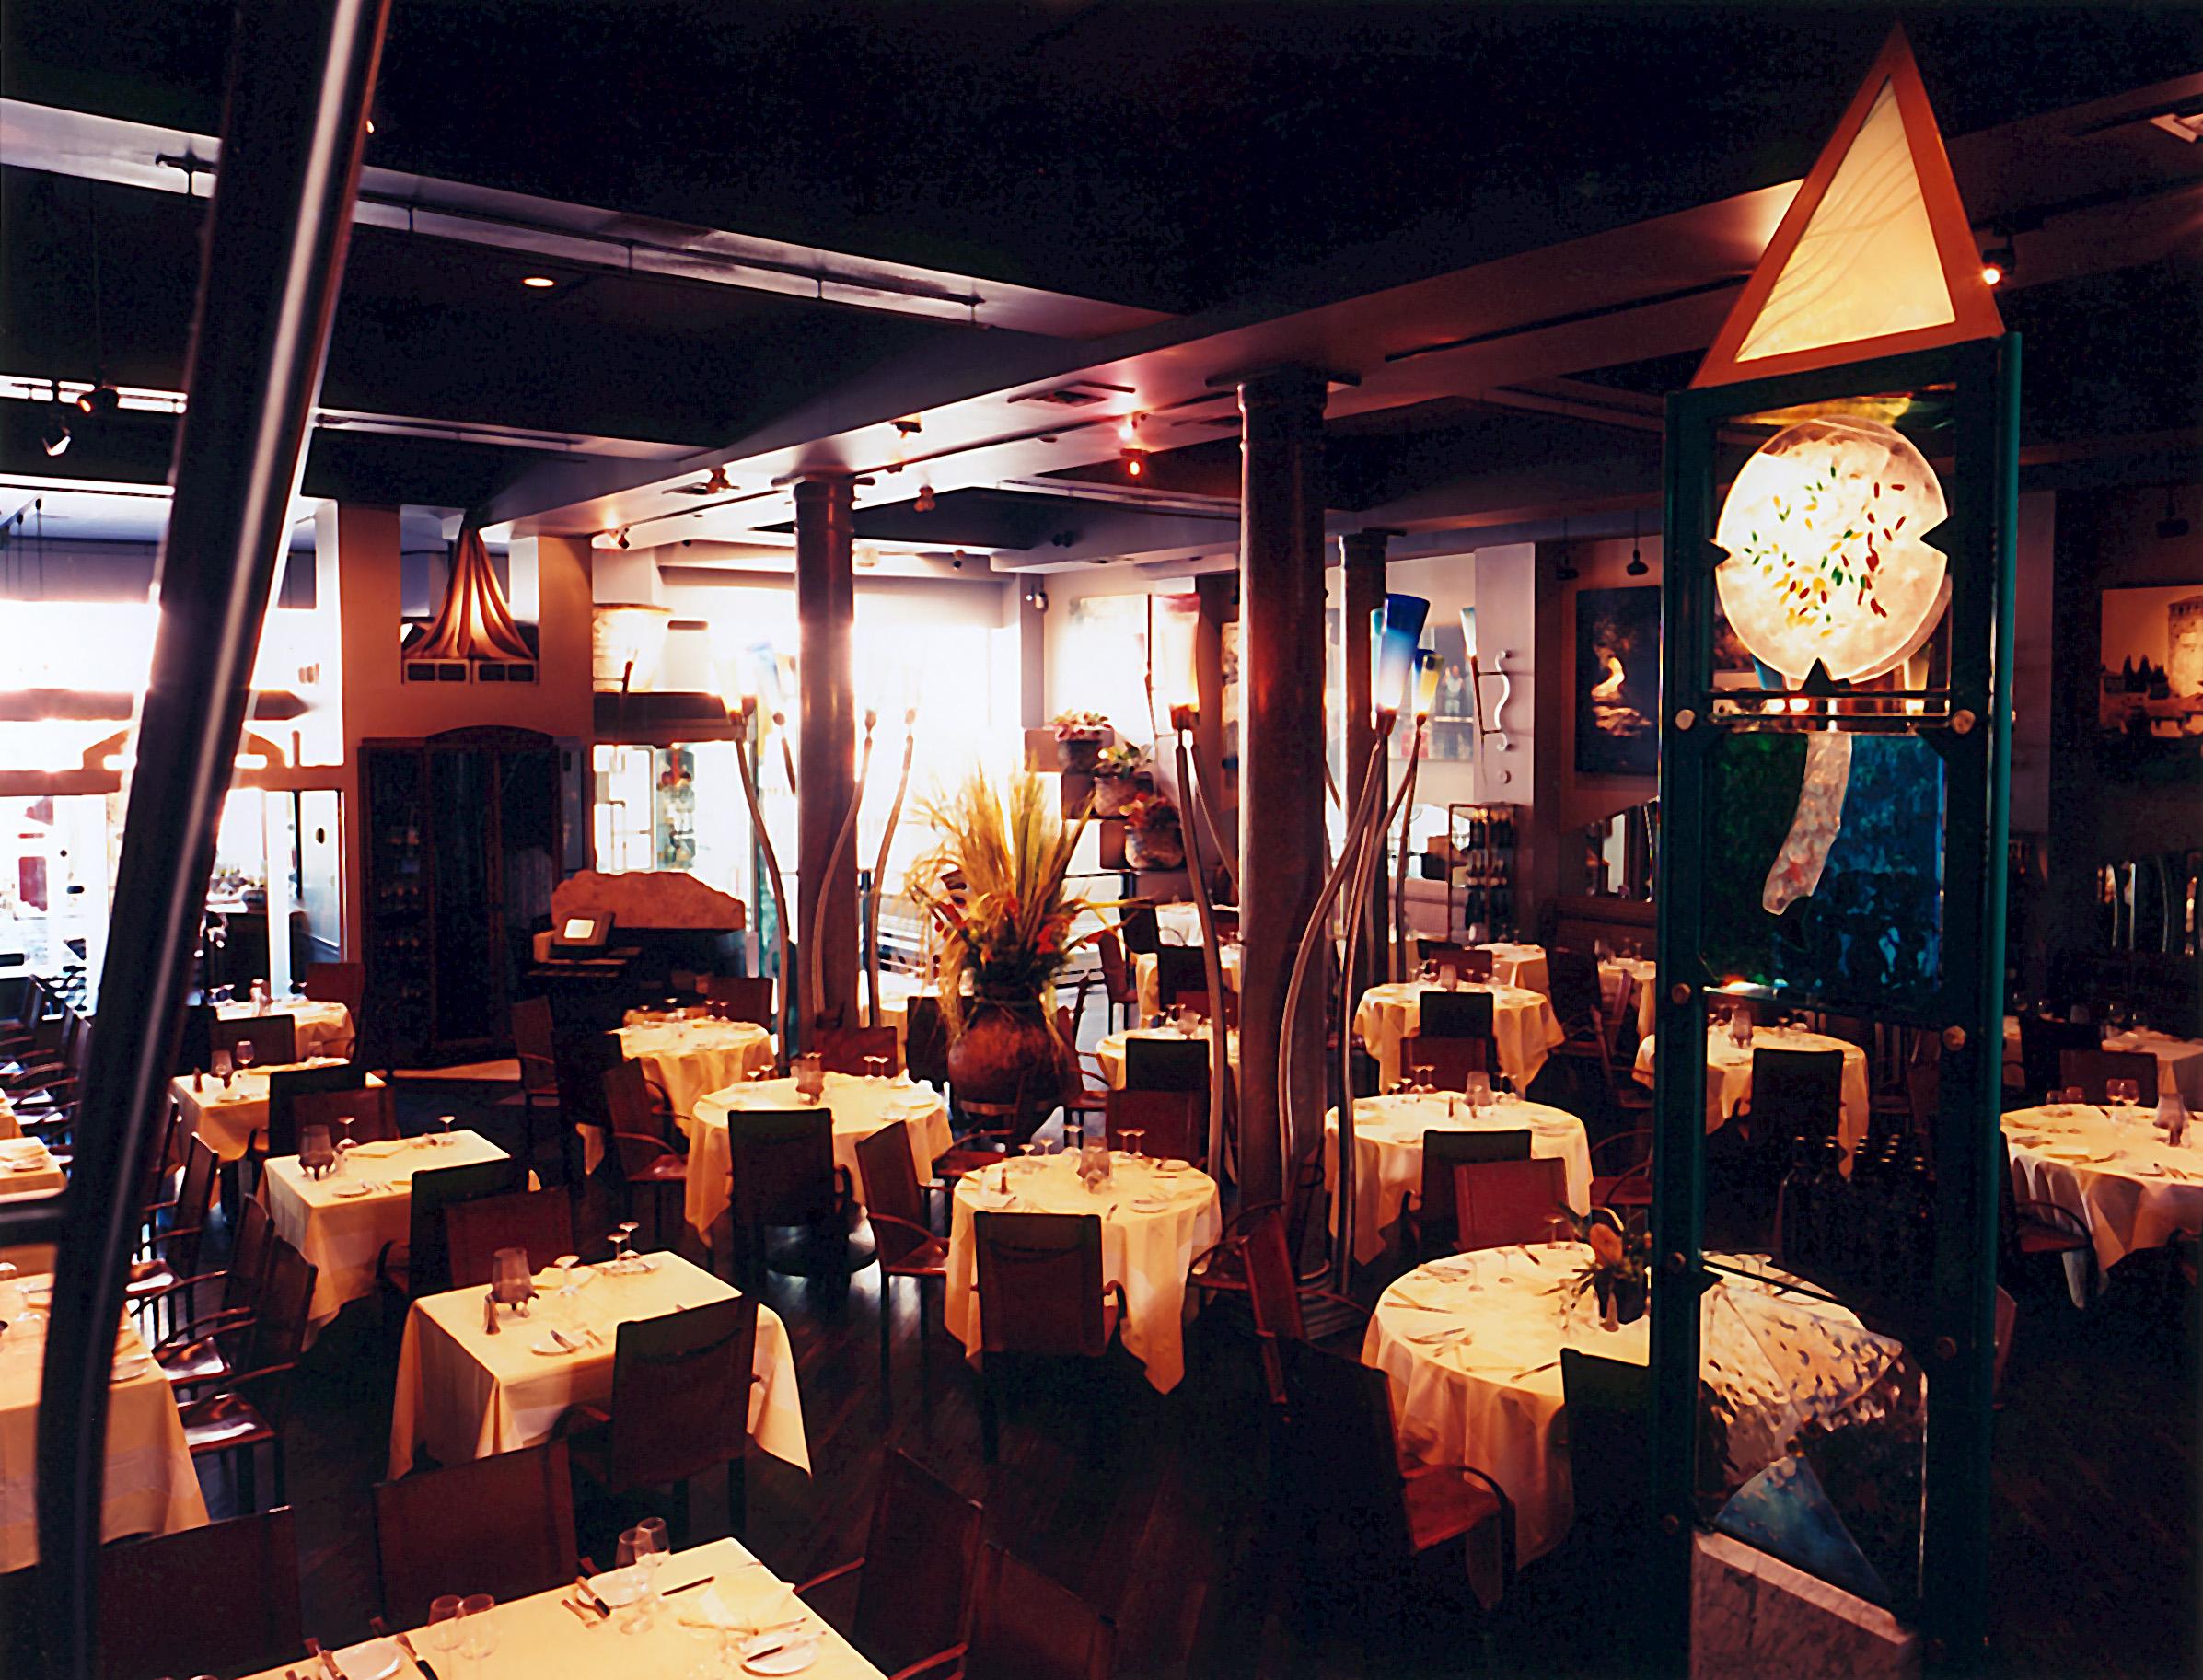 restaurant-interior-1478508